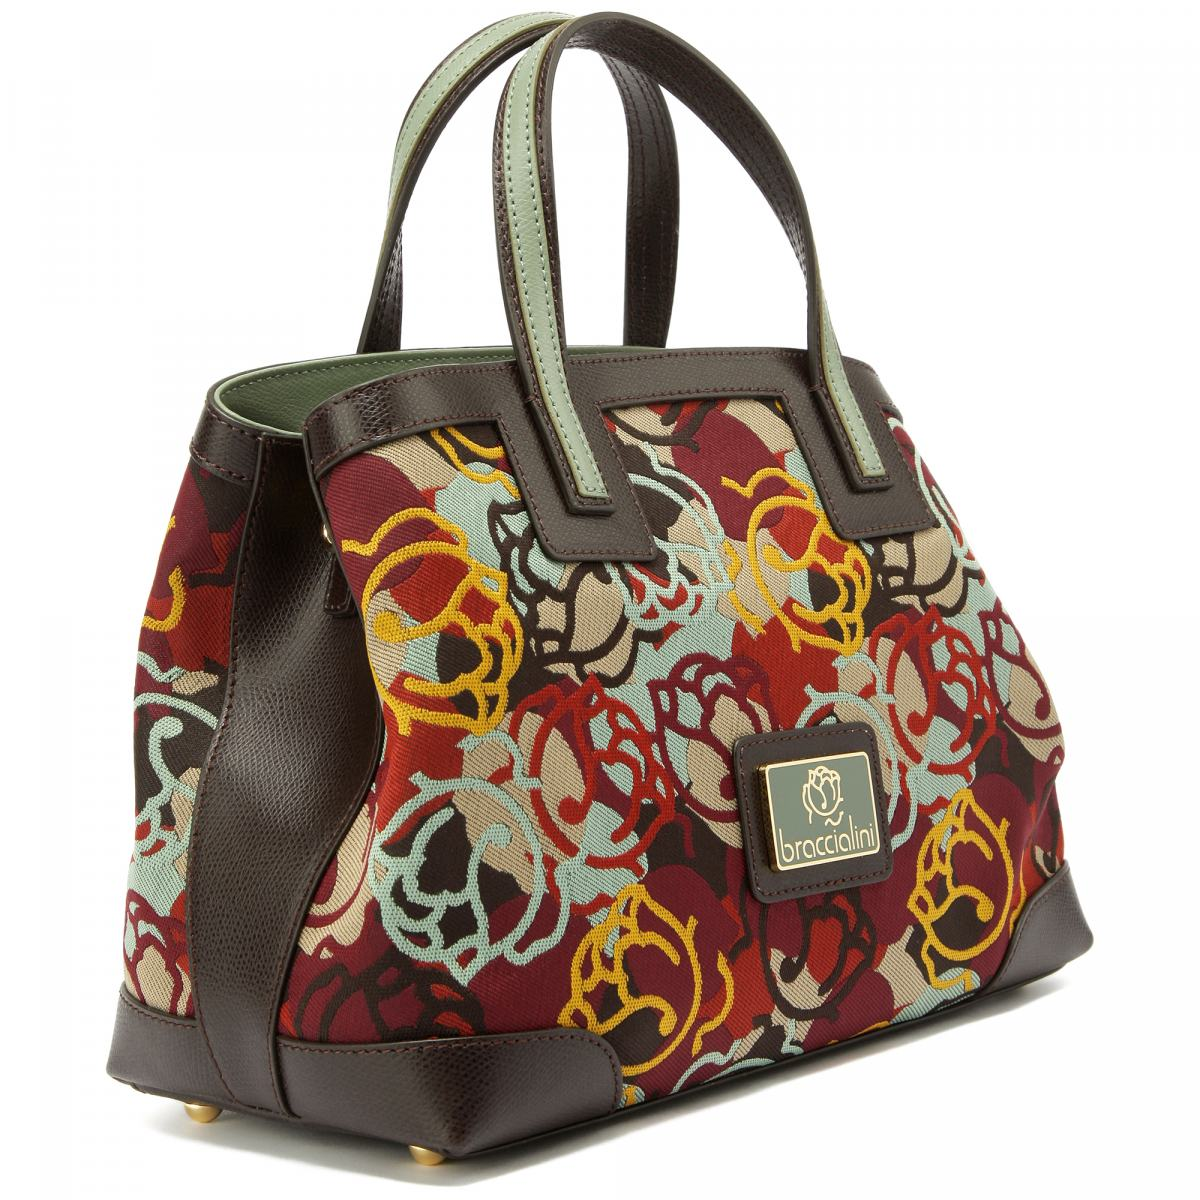 247c87ff55b0 купить женскую сумку Braccialini B2781 Tessuto мультиколор купить женскую сумку  Braccialini B2781 Tessuto мультиколор ...